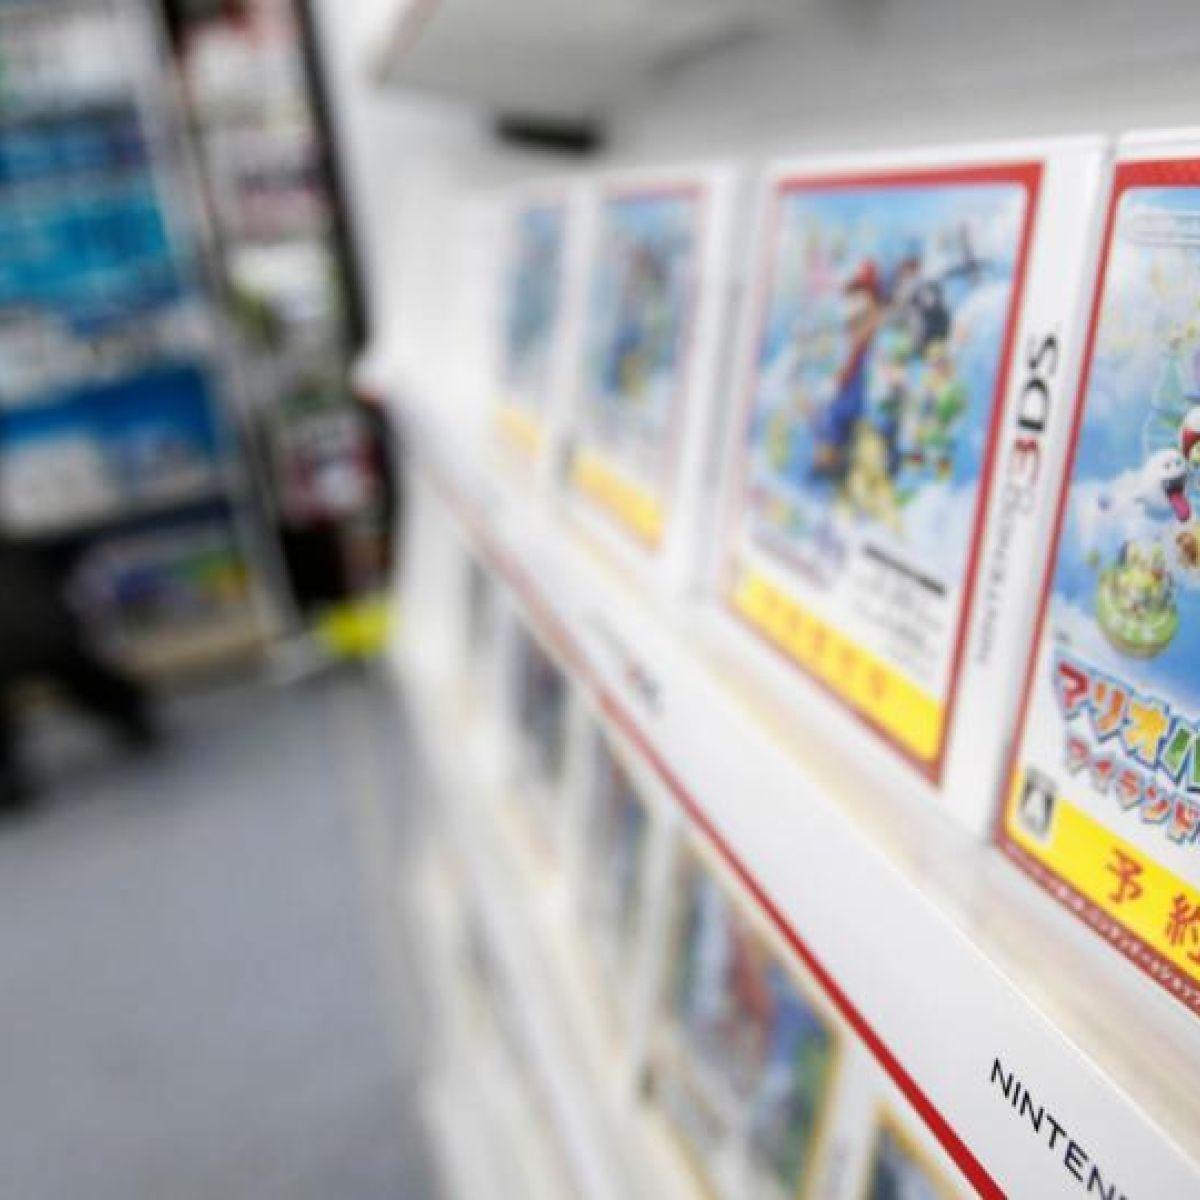 Nintendo under pressure over consoles after poor sales